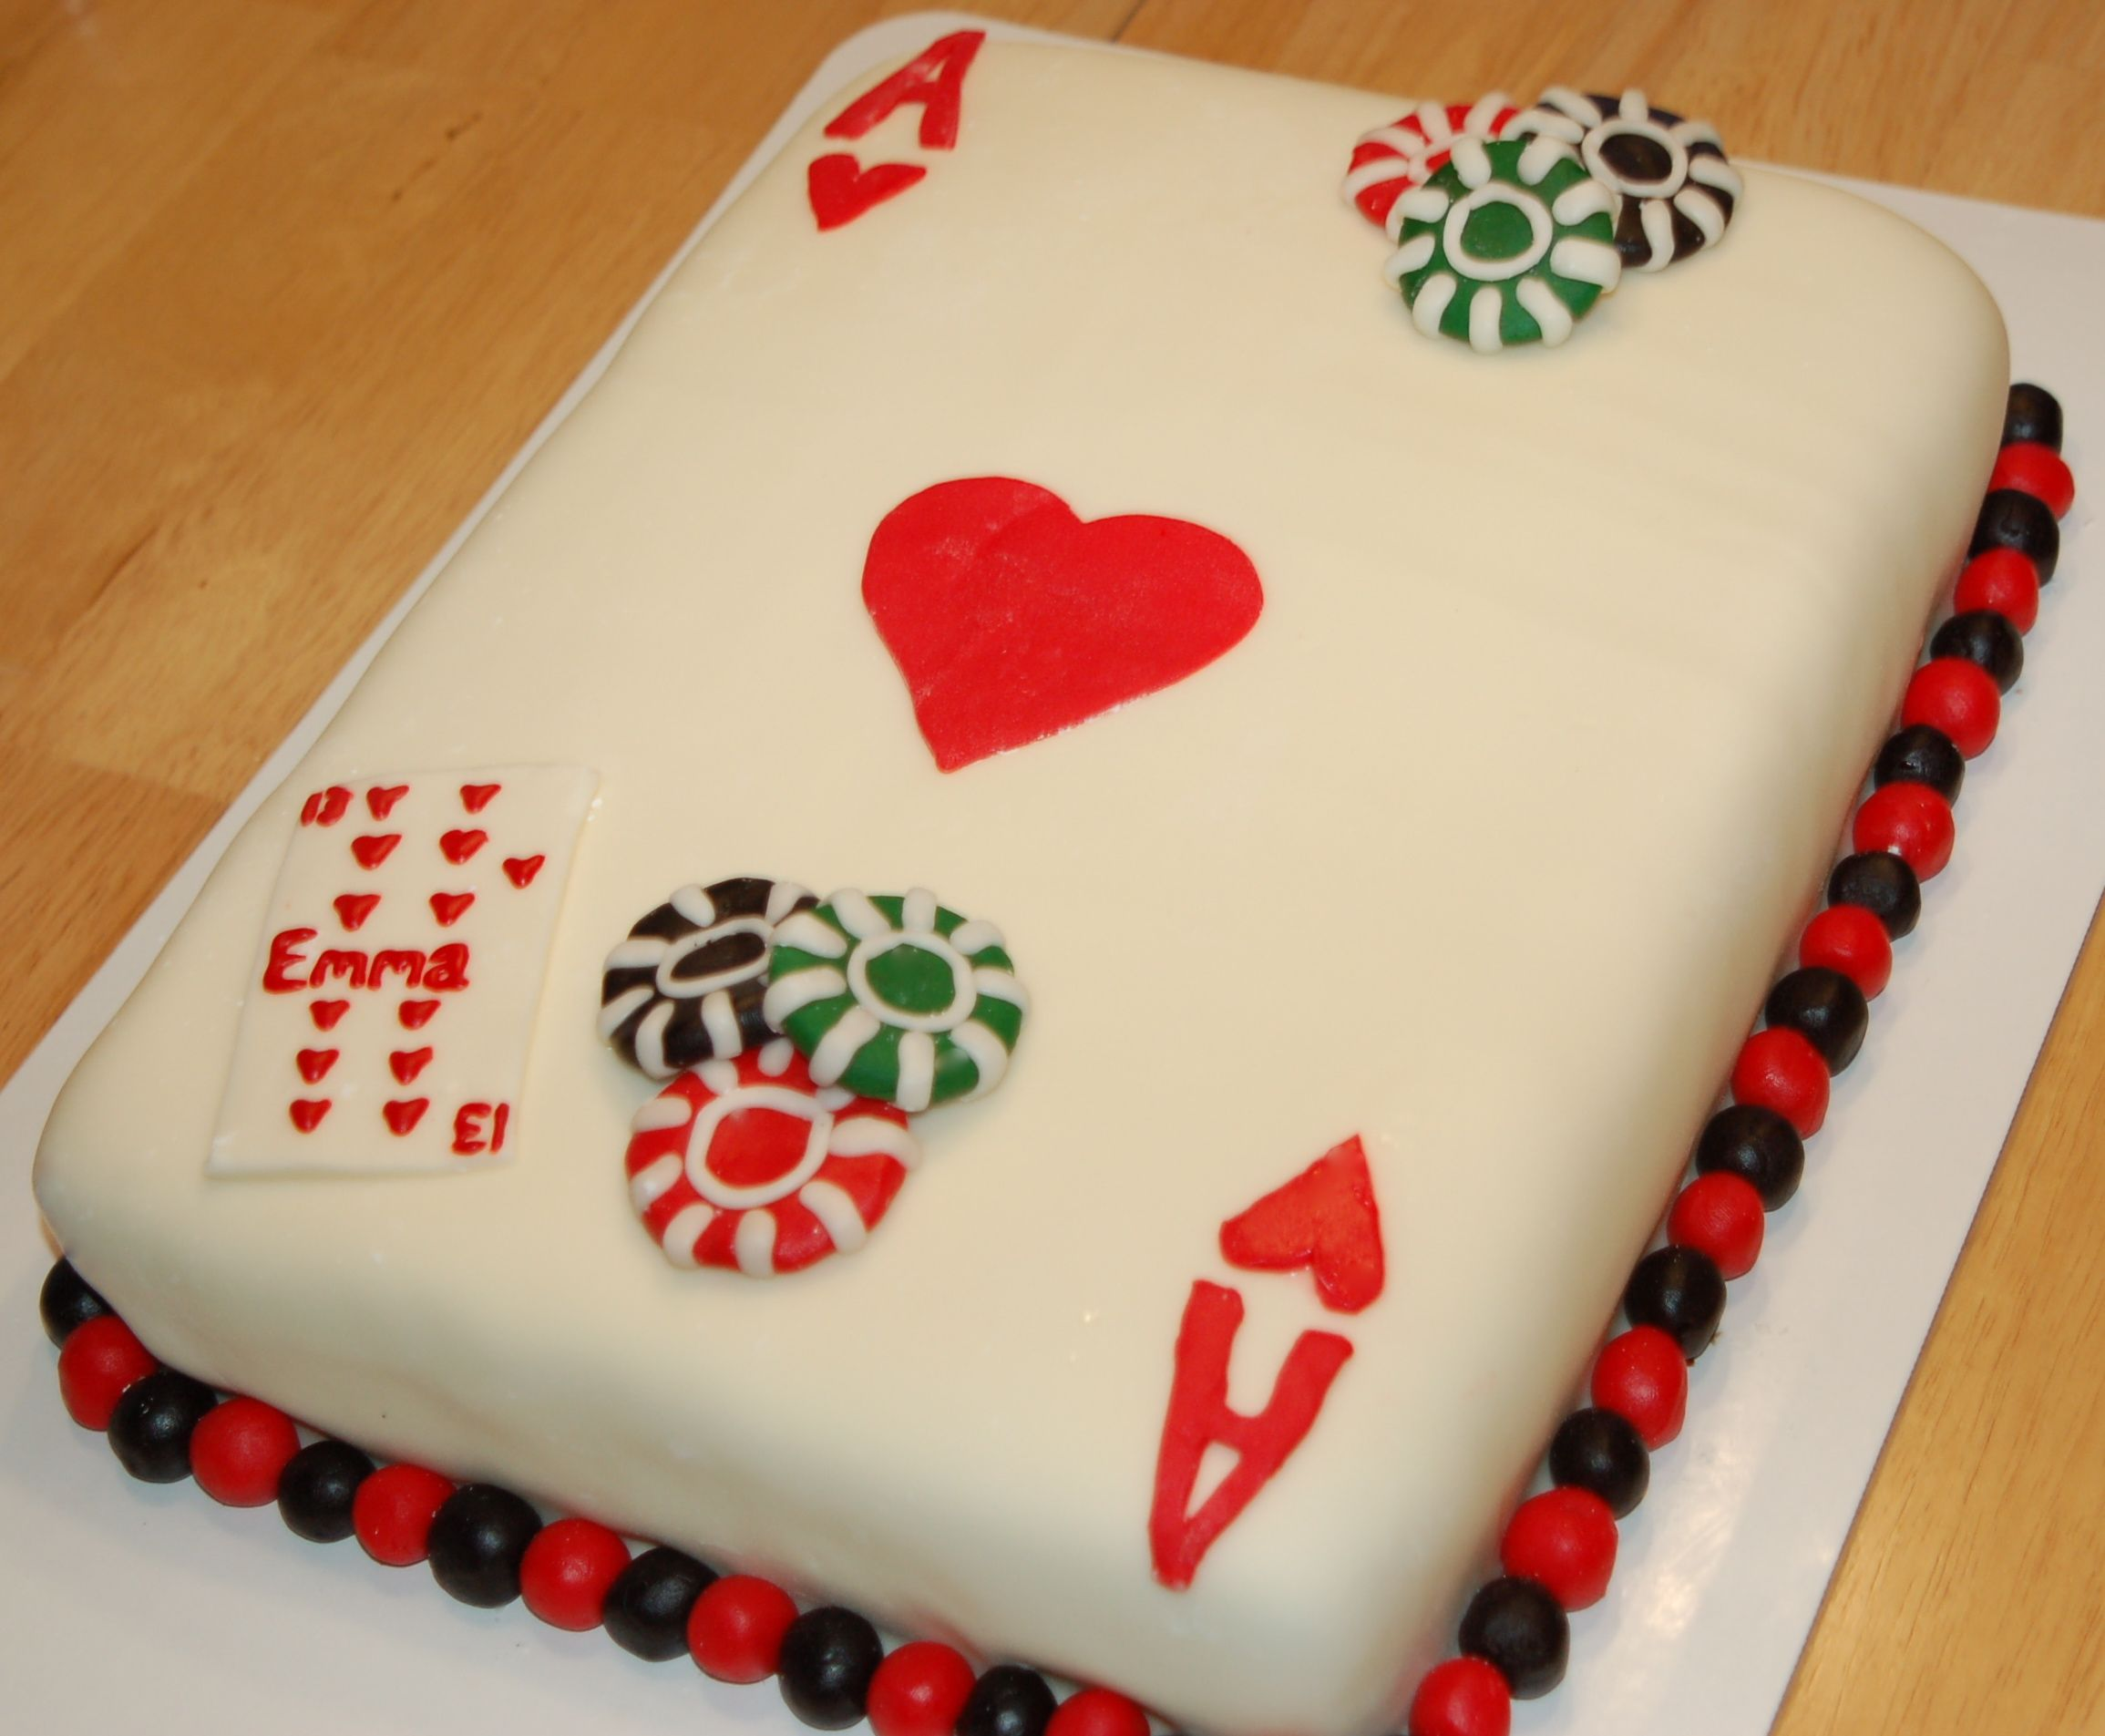 Cake Decoration Playing Cards : Casino playing card cake cakes Pinterest Playing ...